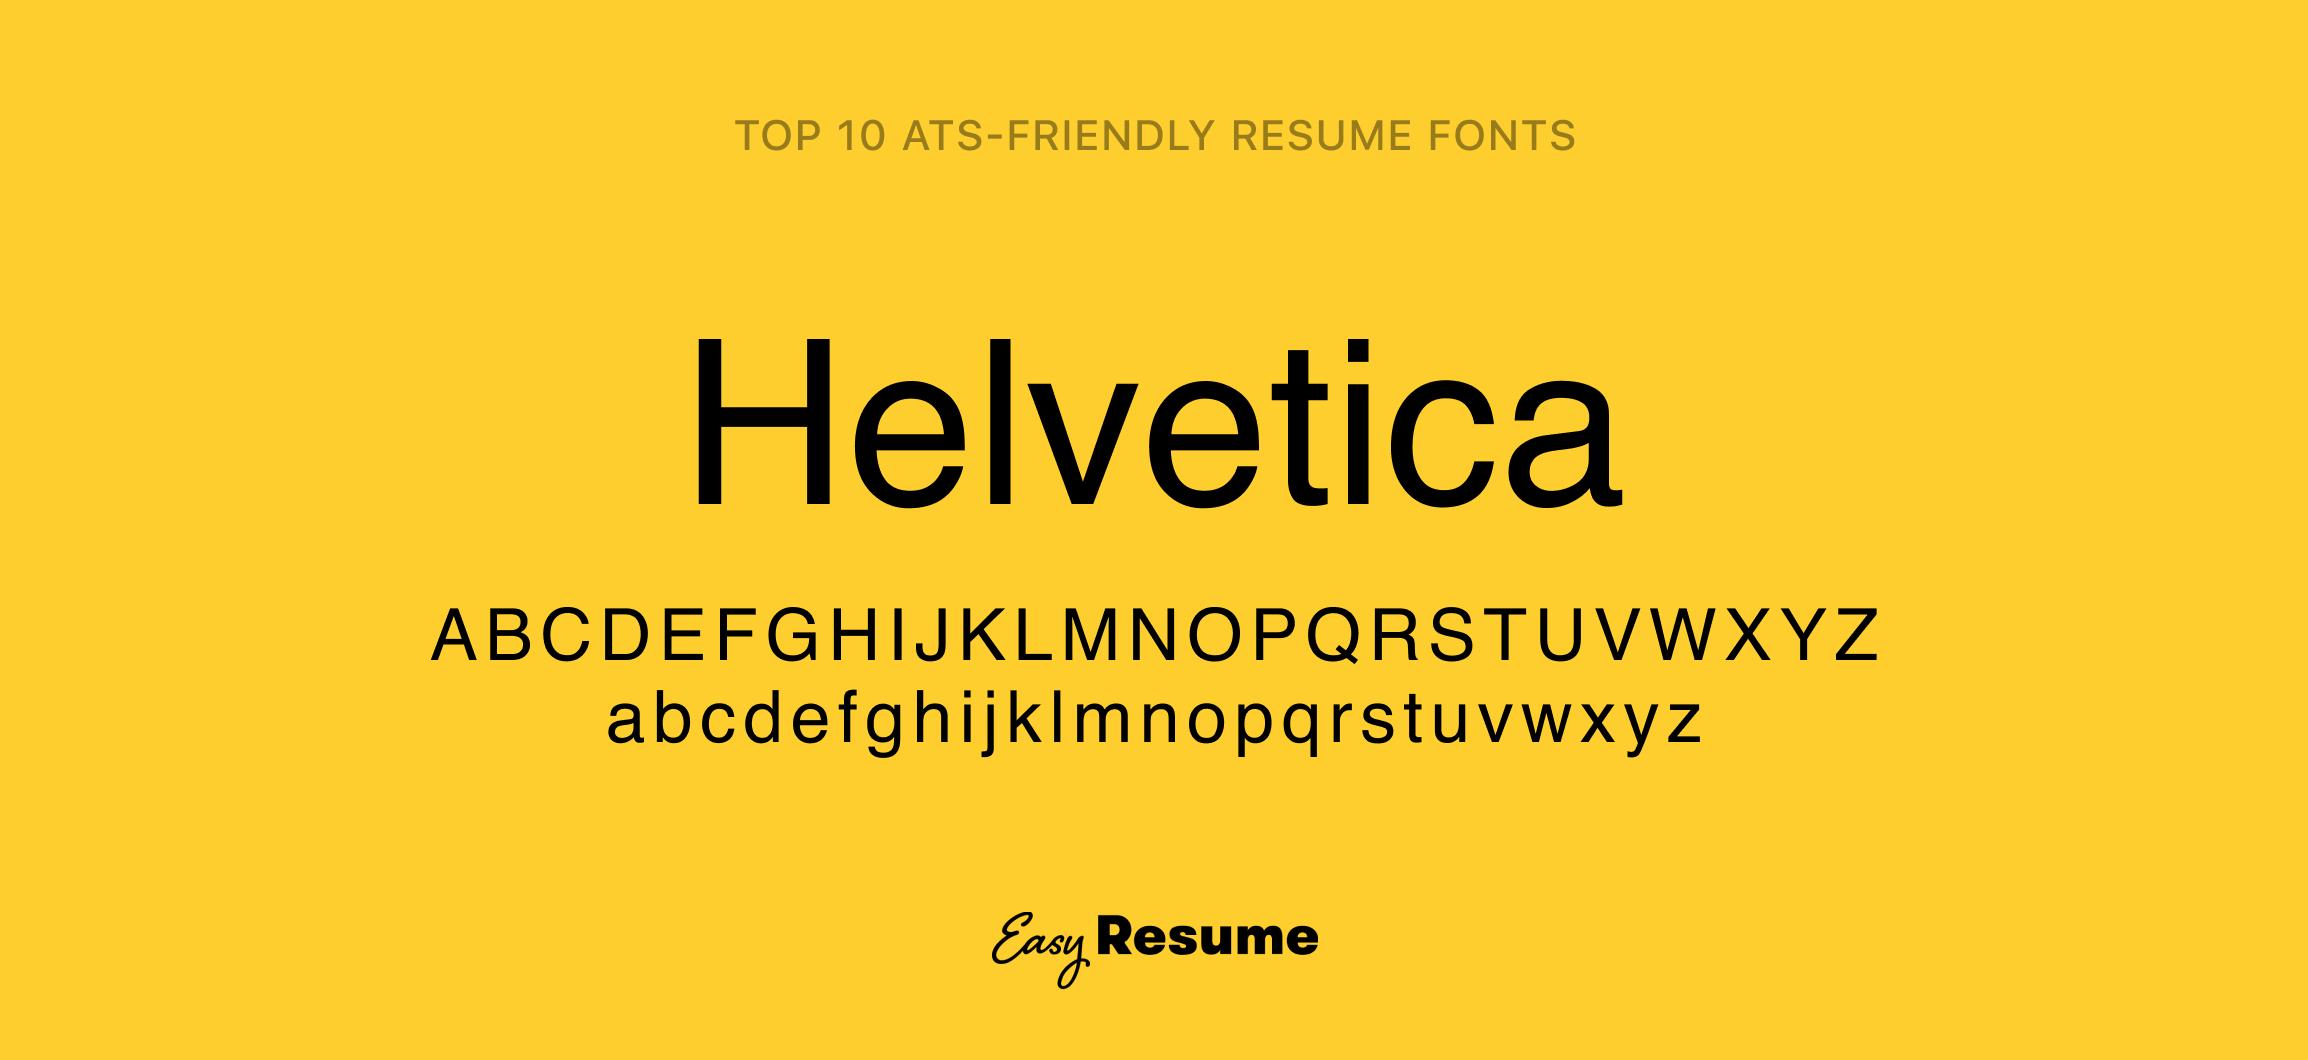 Helvetica Resume Font